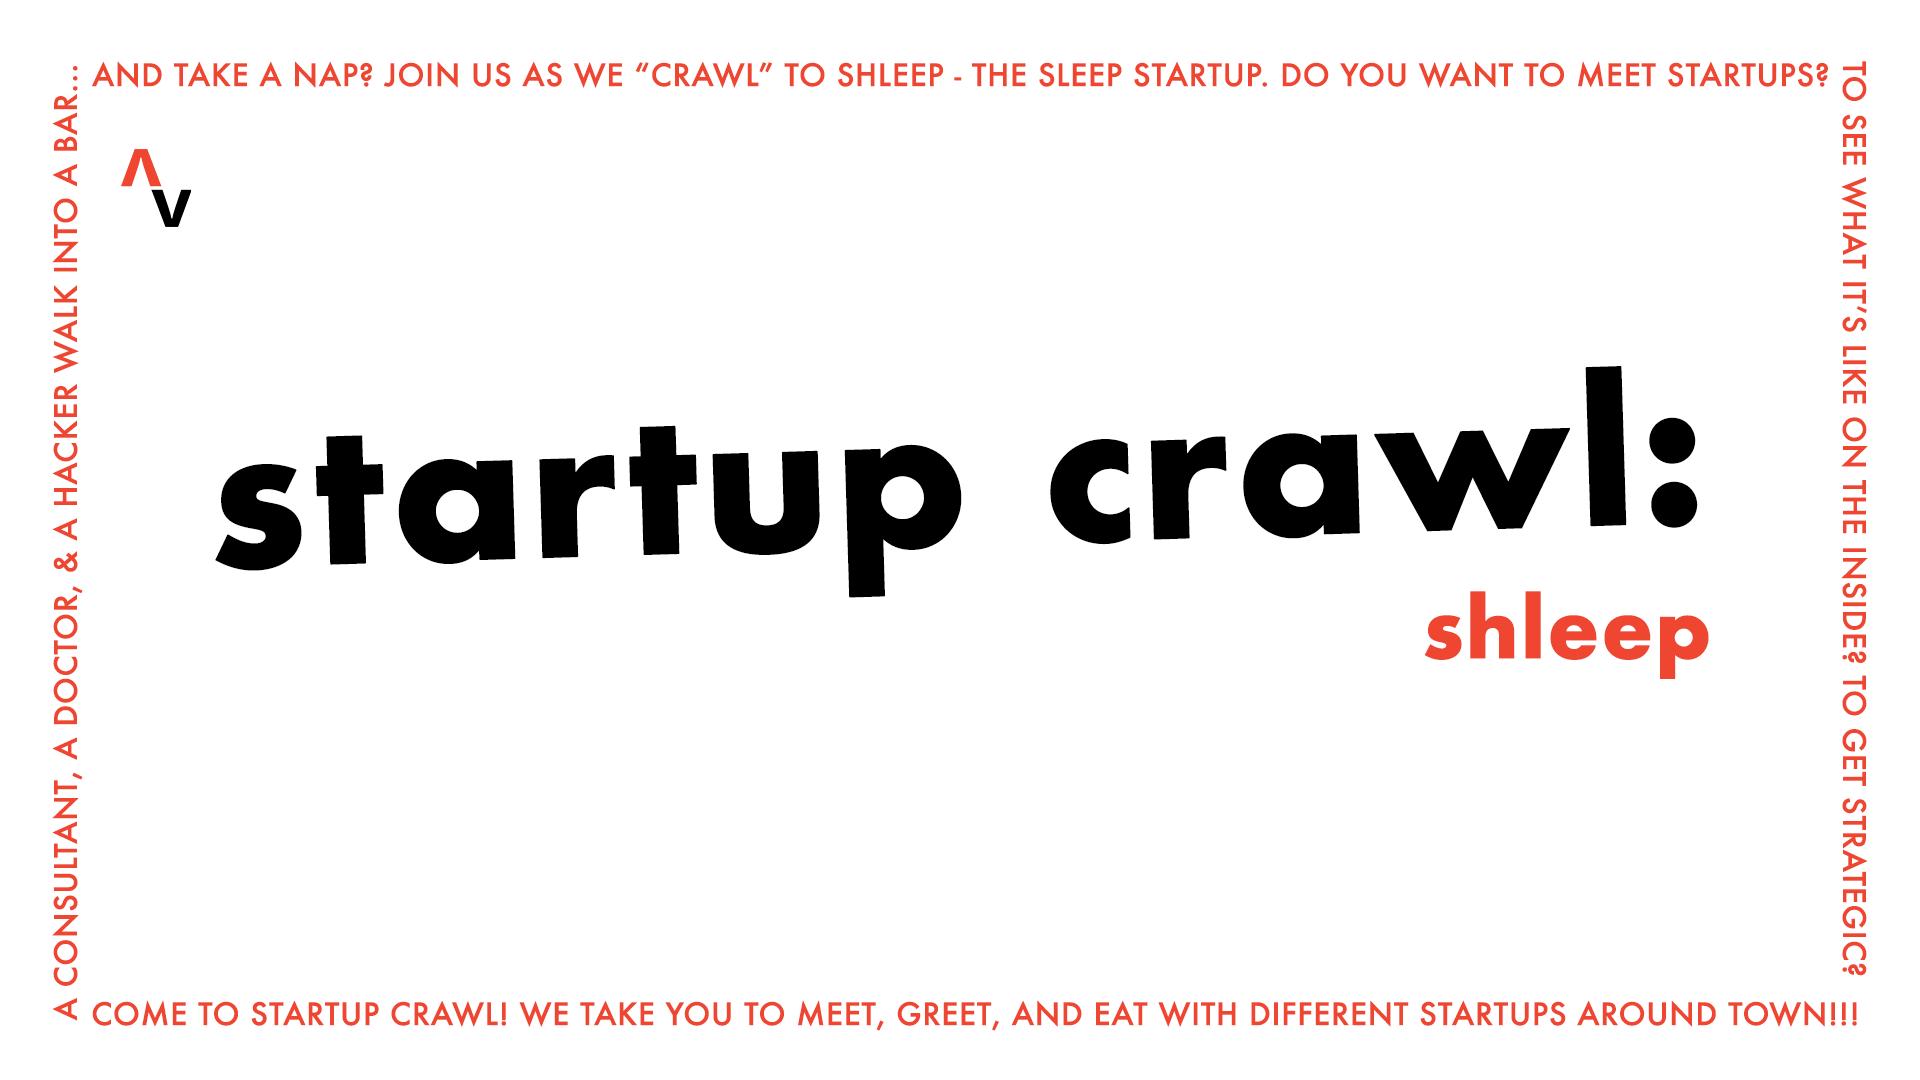 ASIF_Marketing_Startup-Crawl_Shleep_facebook.png